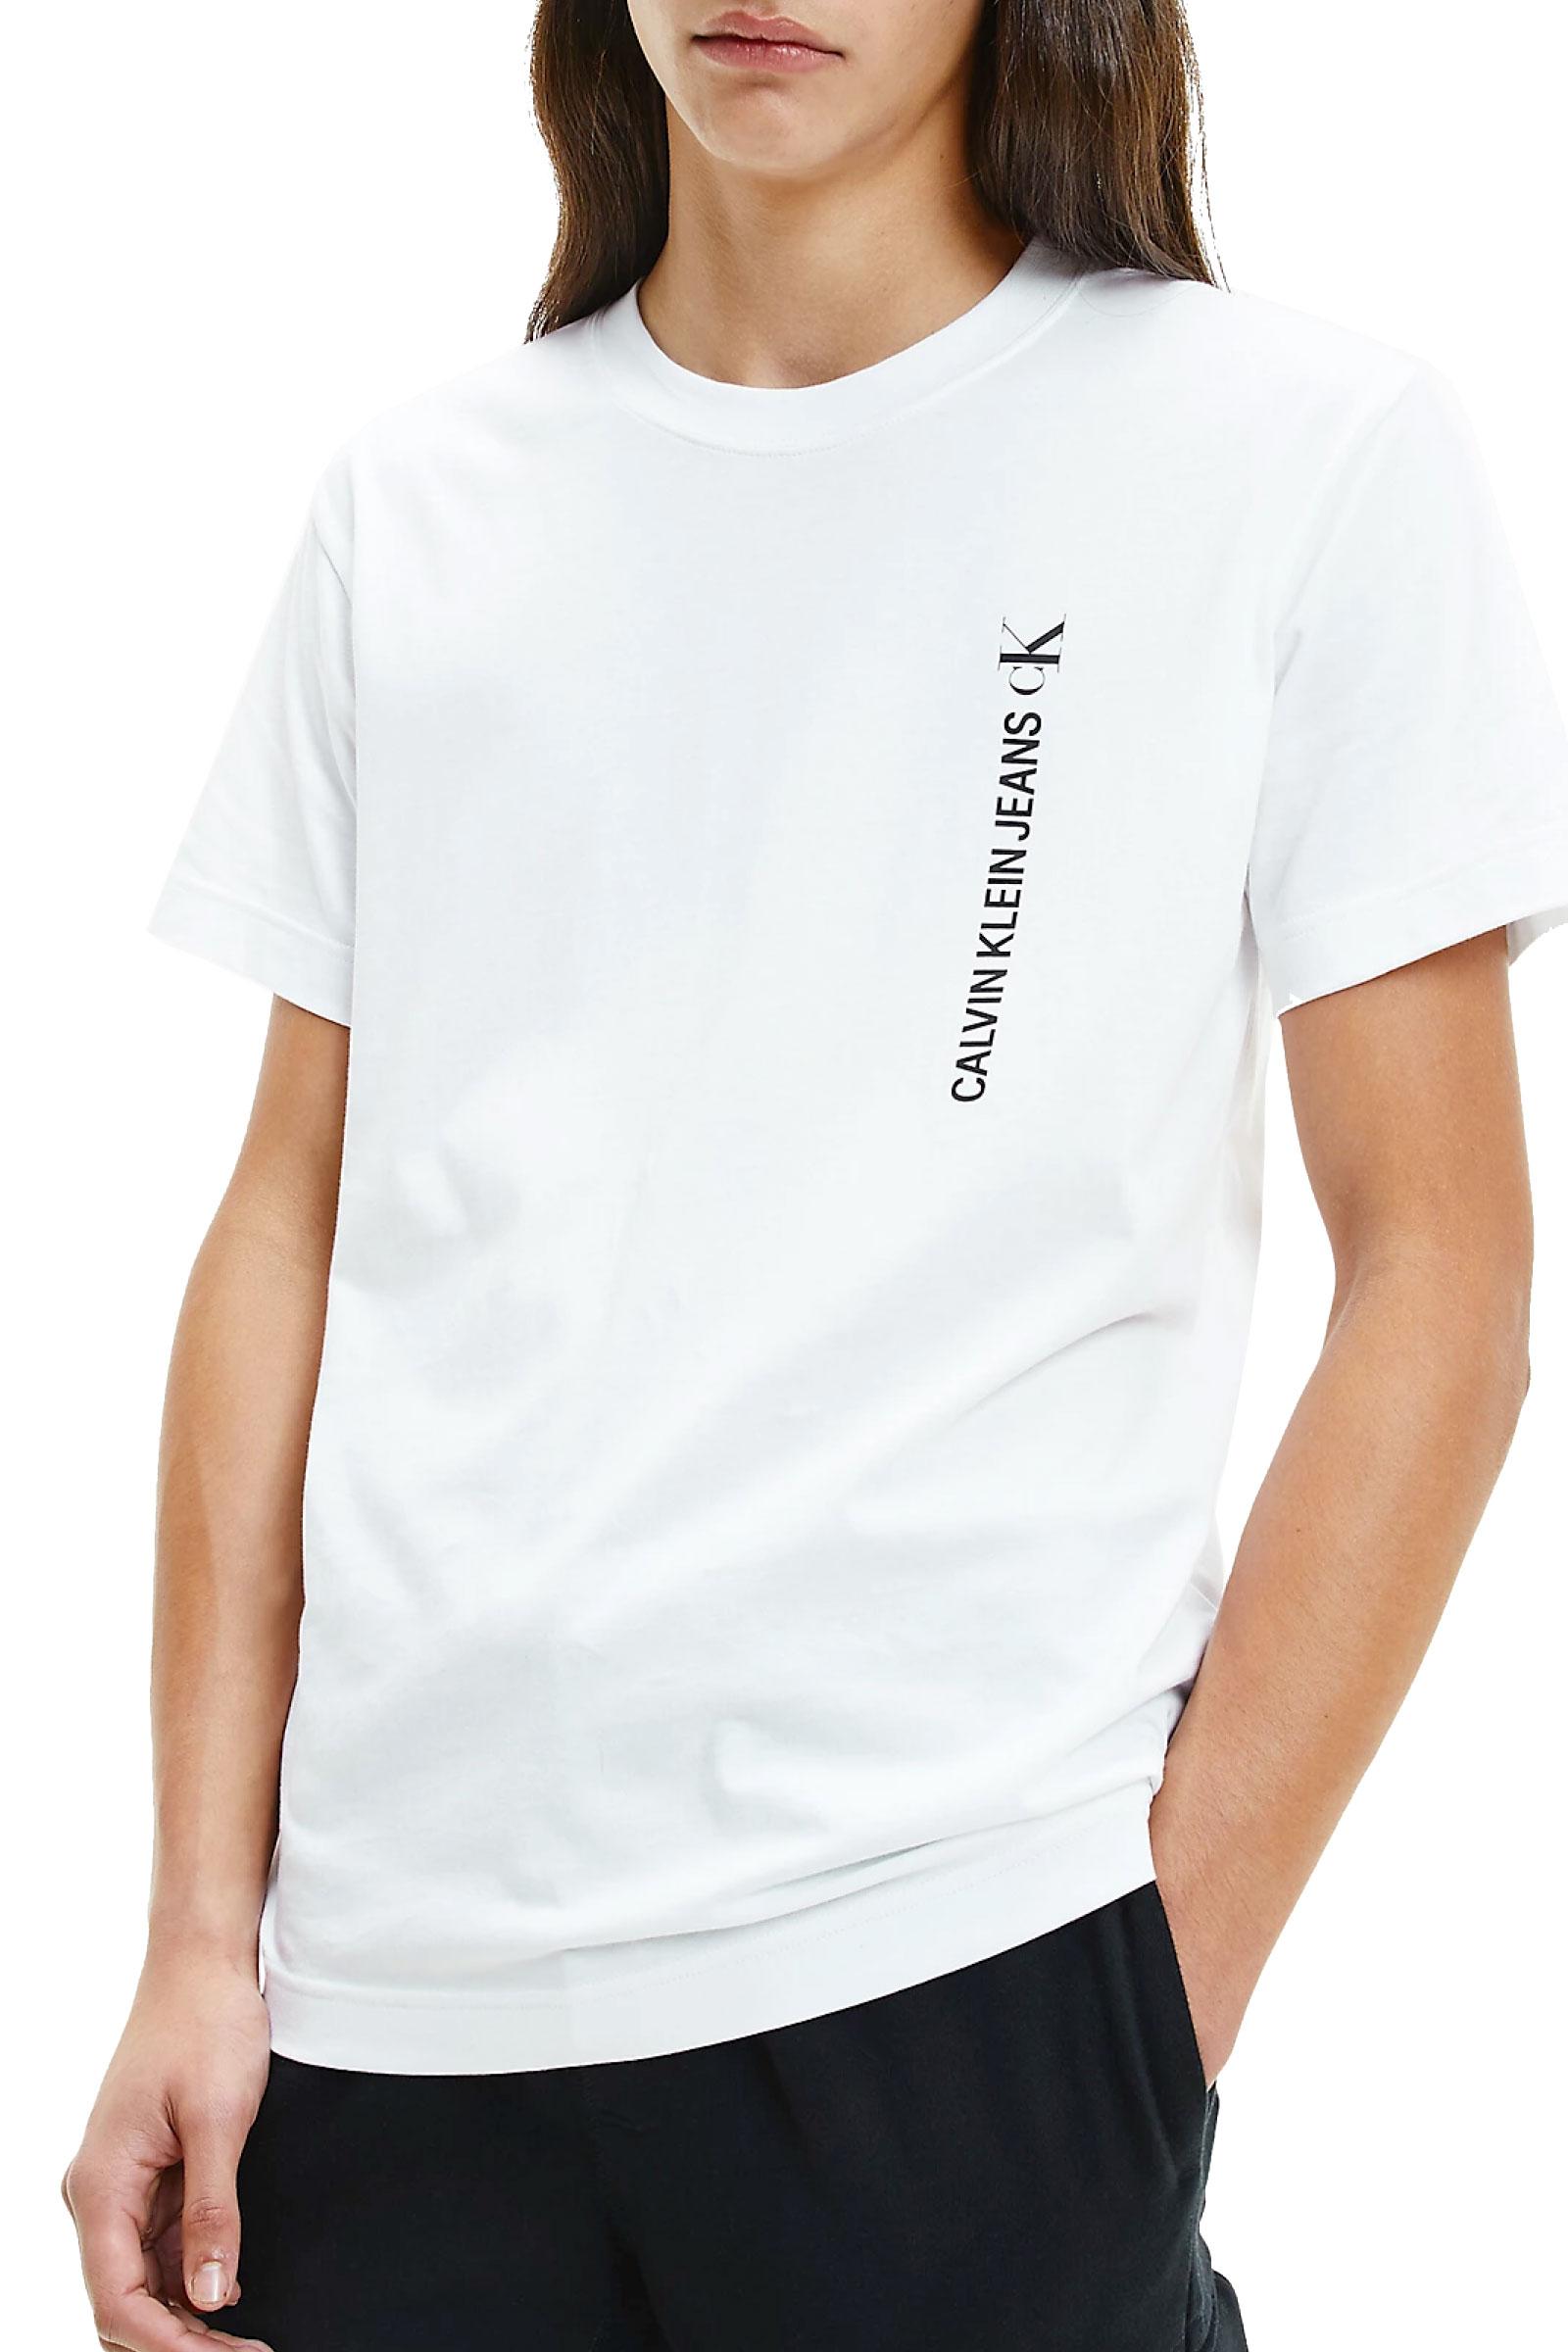 CALVIN KLEIN JEANS T-Shirt Uomo CALVIN KLEIN JEANS   T-Shirt   J30J318303YAF